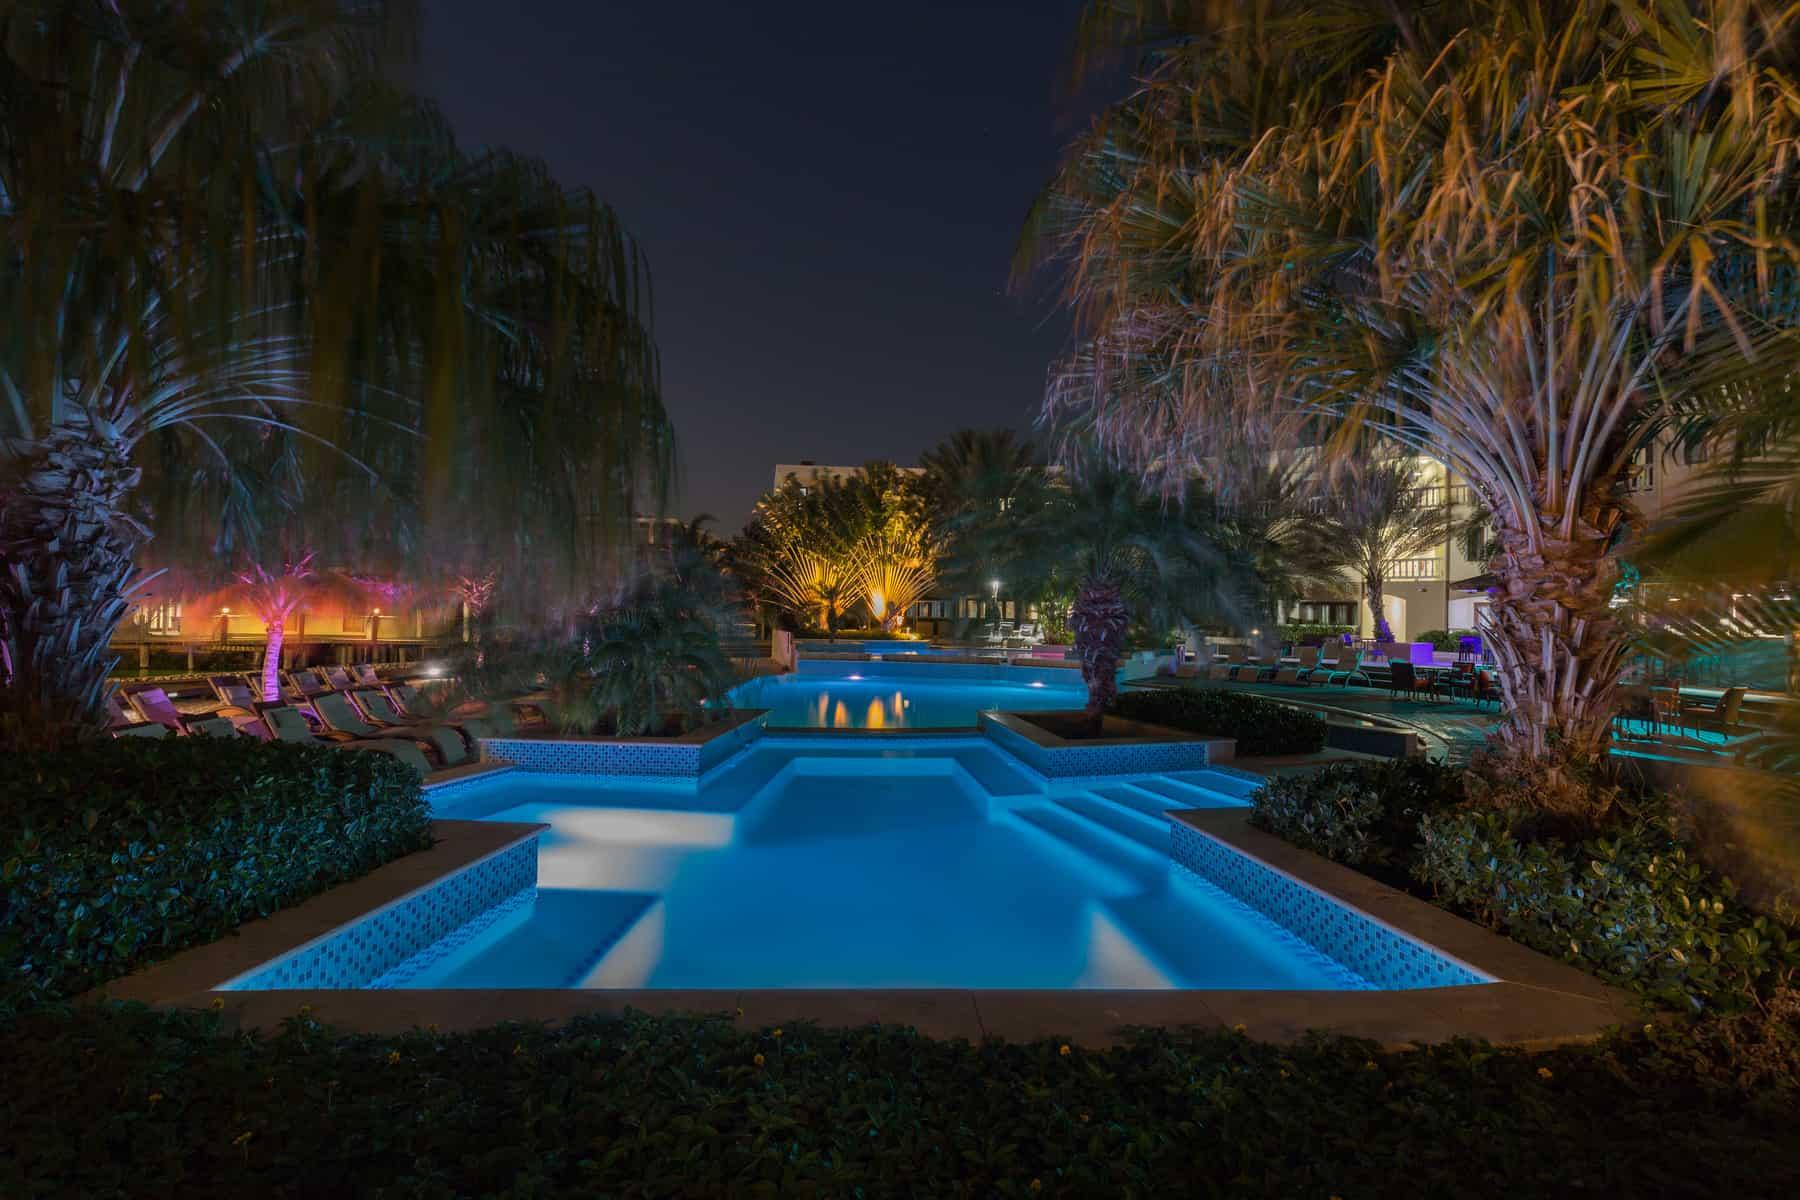 Swimming pool night view Acoya Curacao